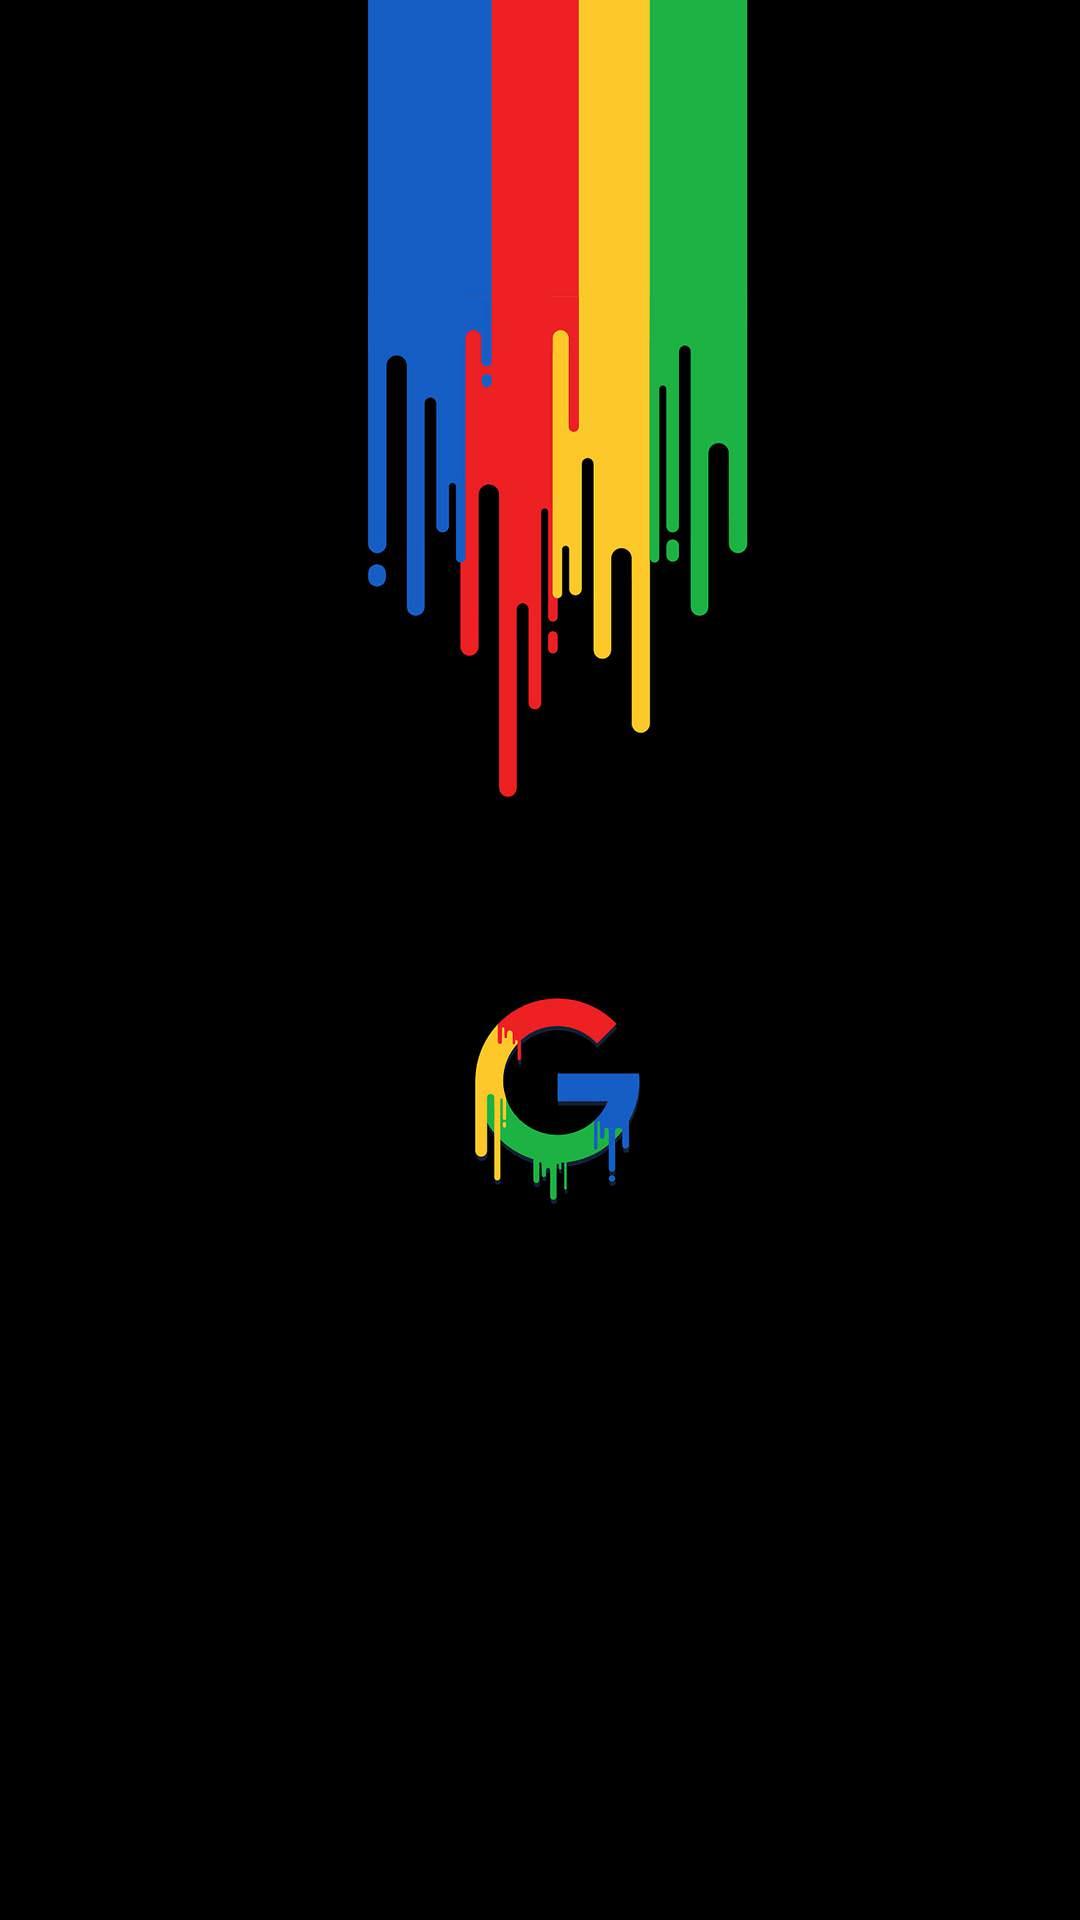 38+ Google Pixel 2 XL Wallpapers on WallpaperSafari